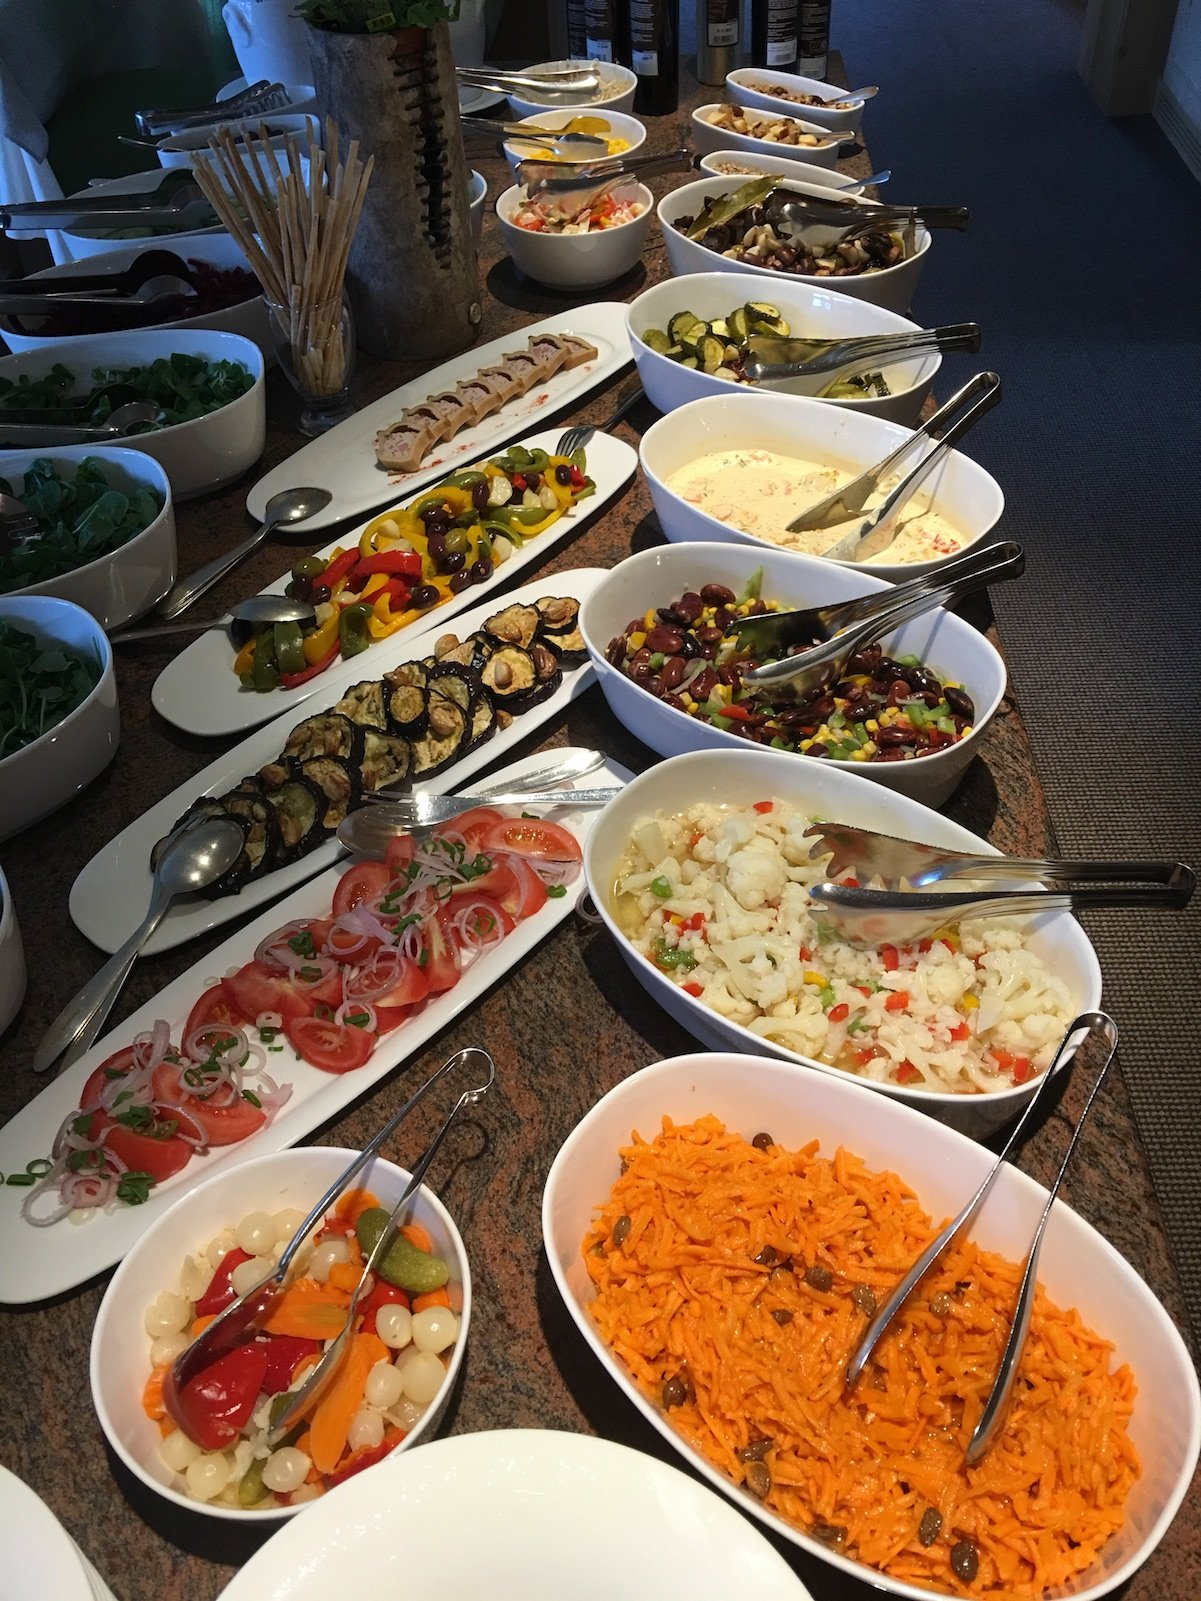 Salatbuffet im Hotel Aurora in Lech am Arlberg